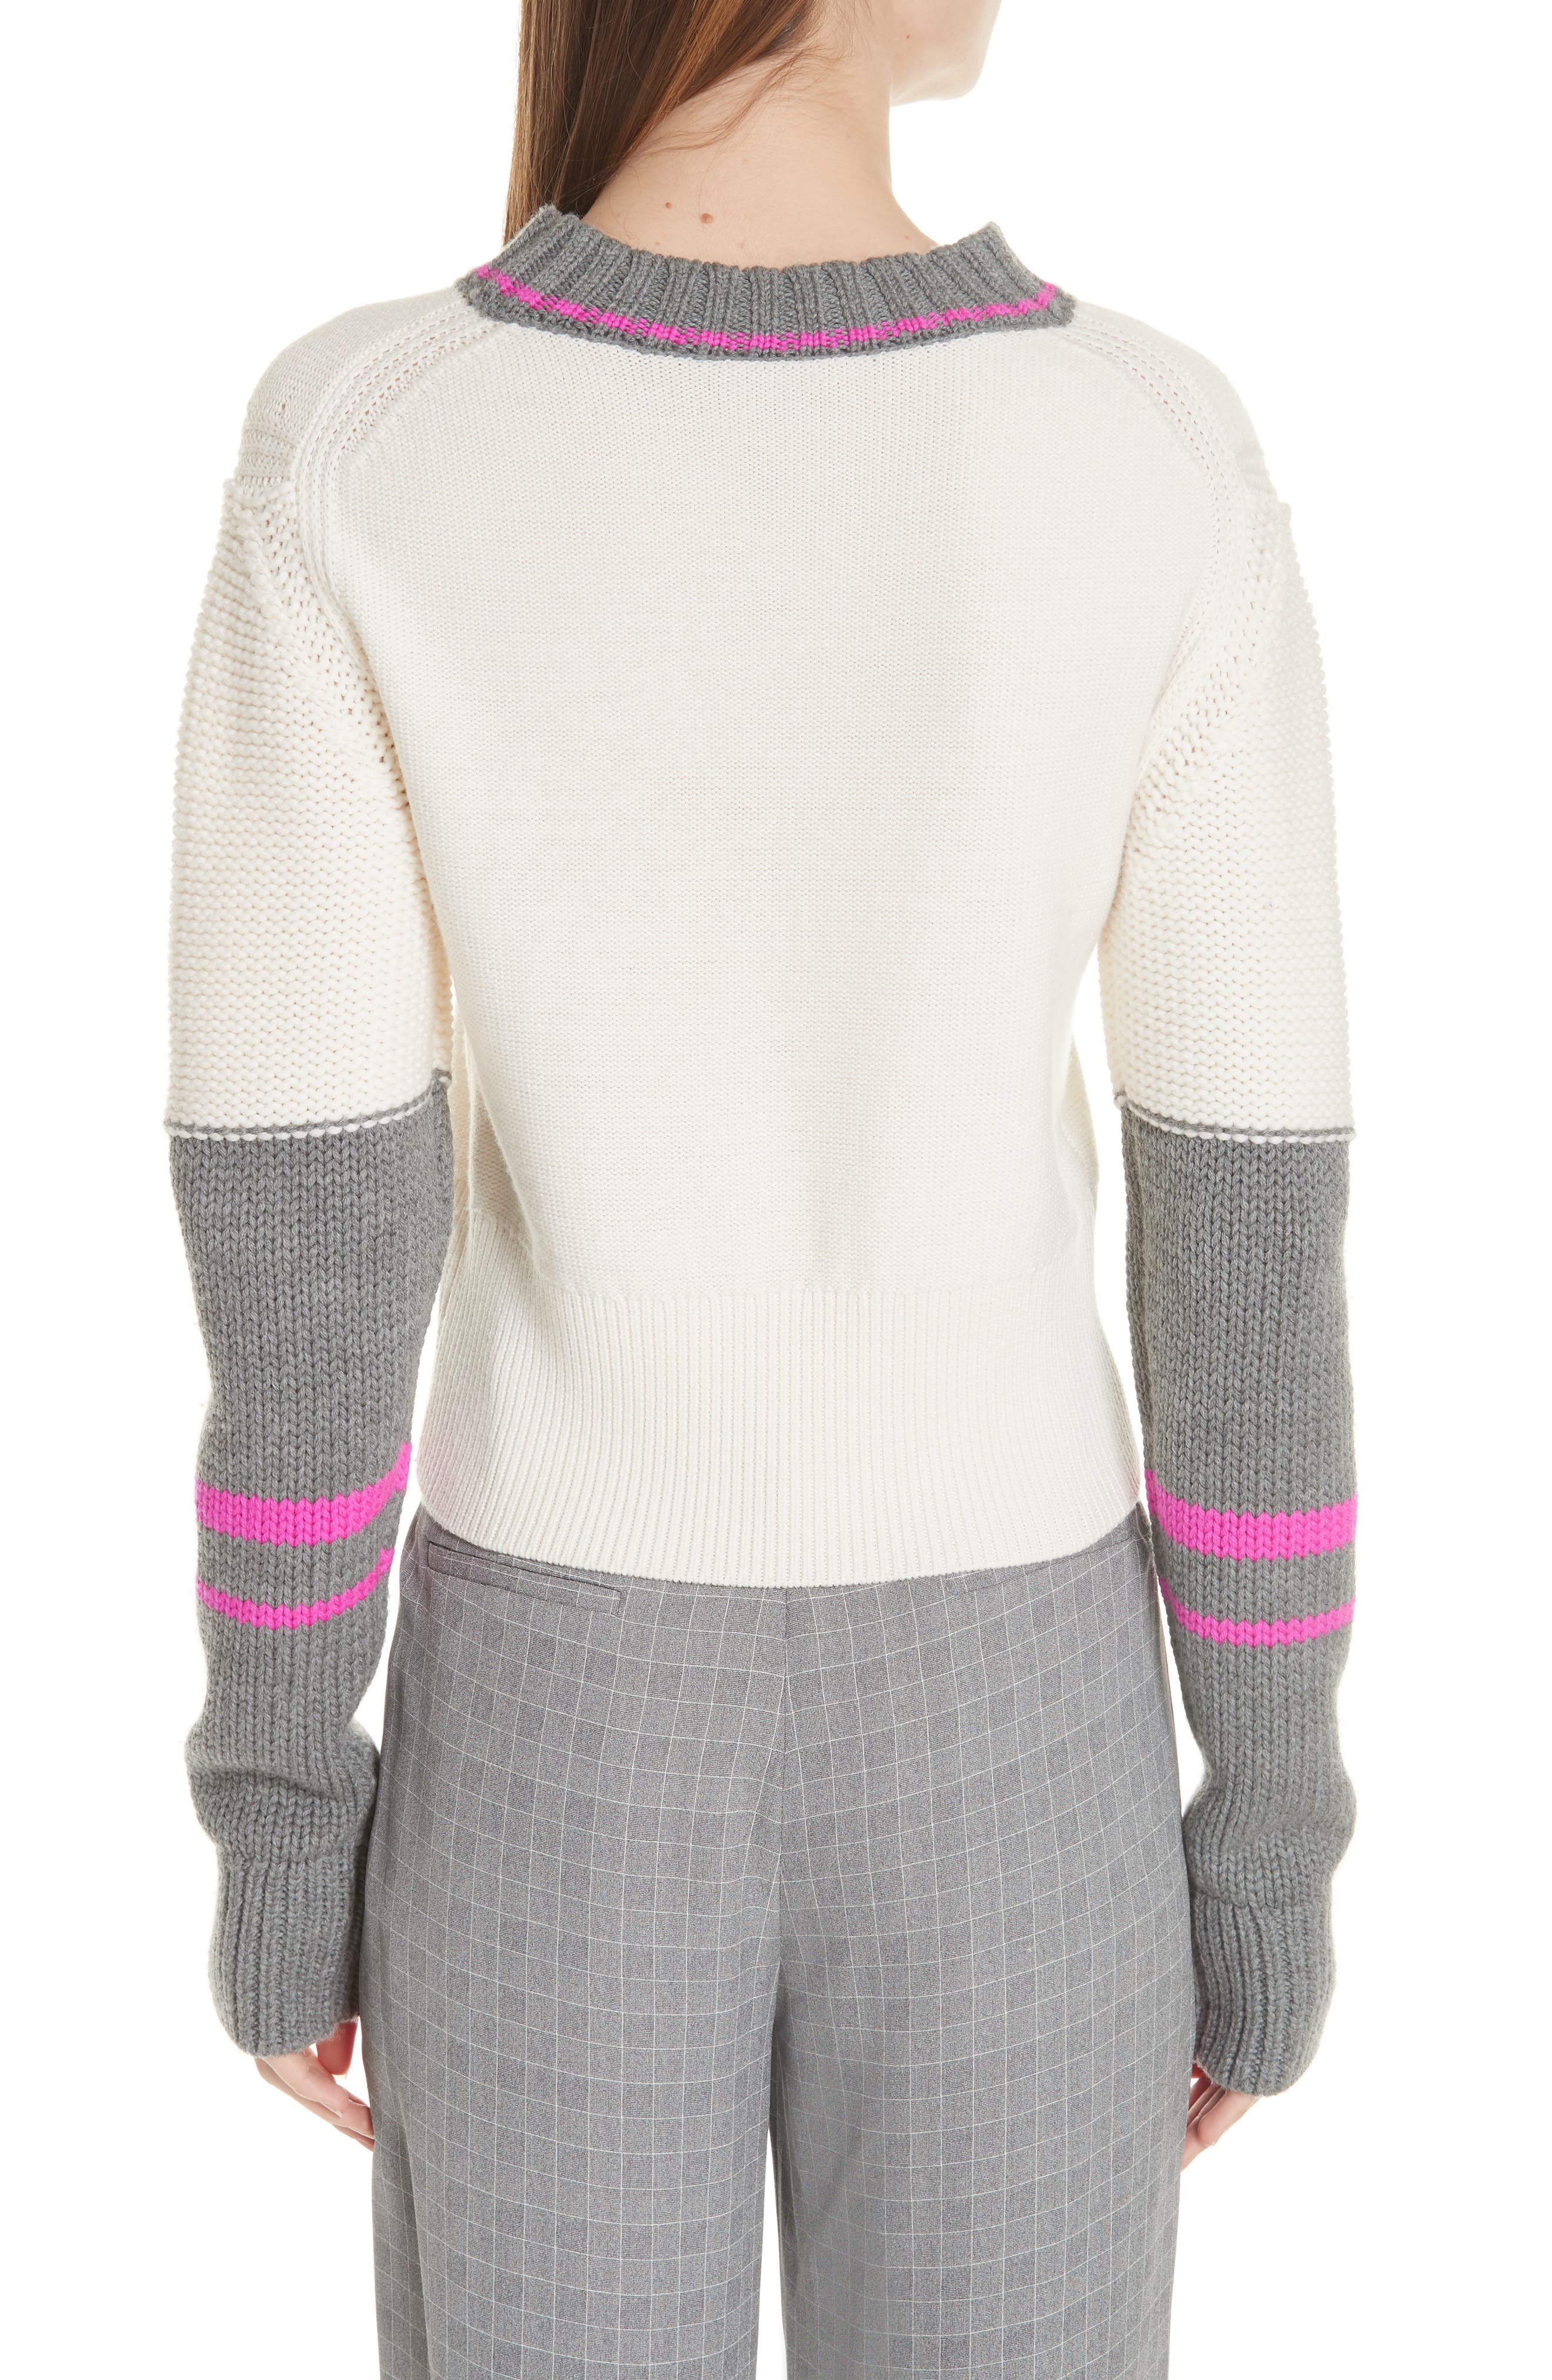 Grey Jason Wu Colorblock Merino Wool Sweater, White